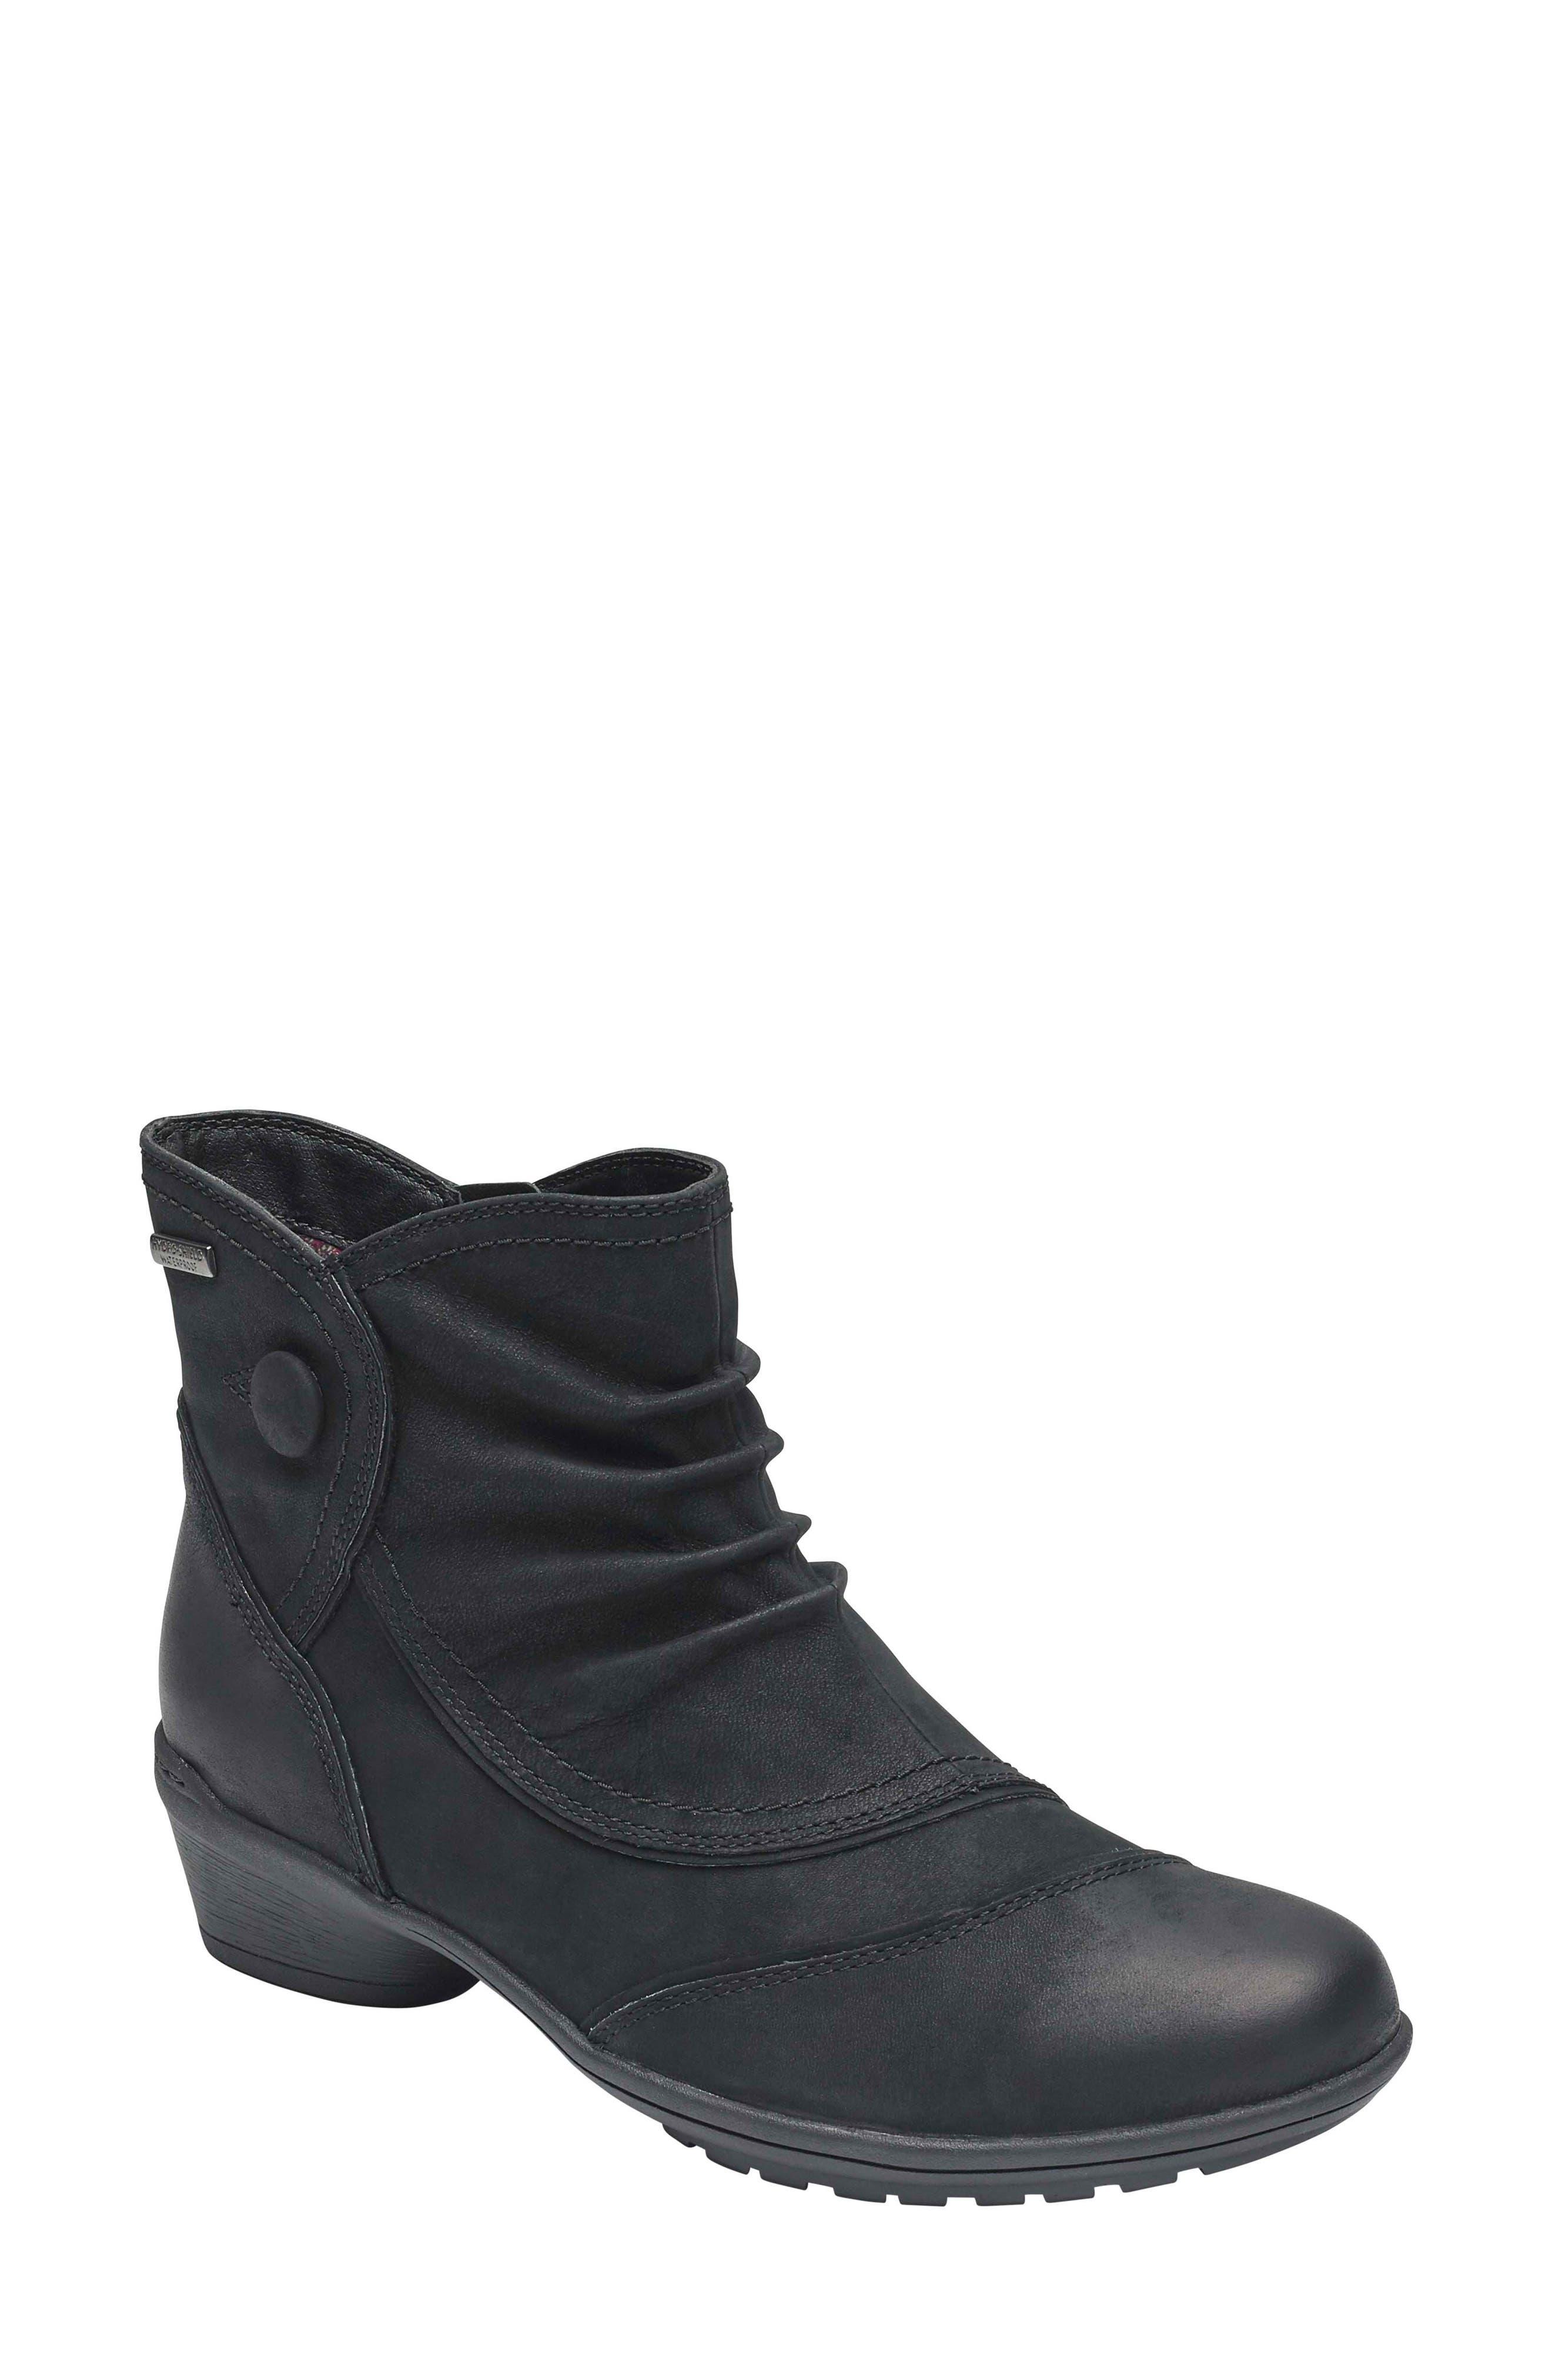 Raven Waterproof Bootie, Main, color, BLACK WATERPROOF NUBUCK